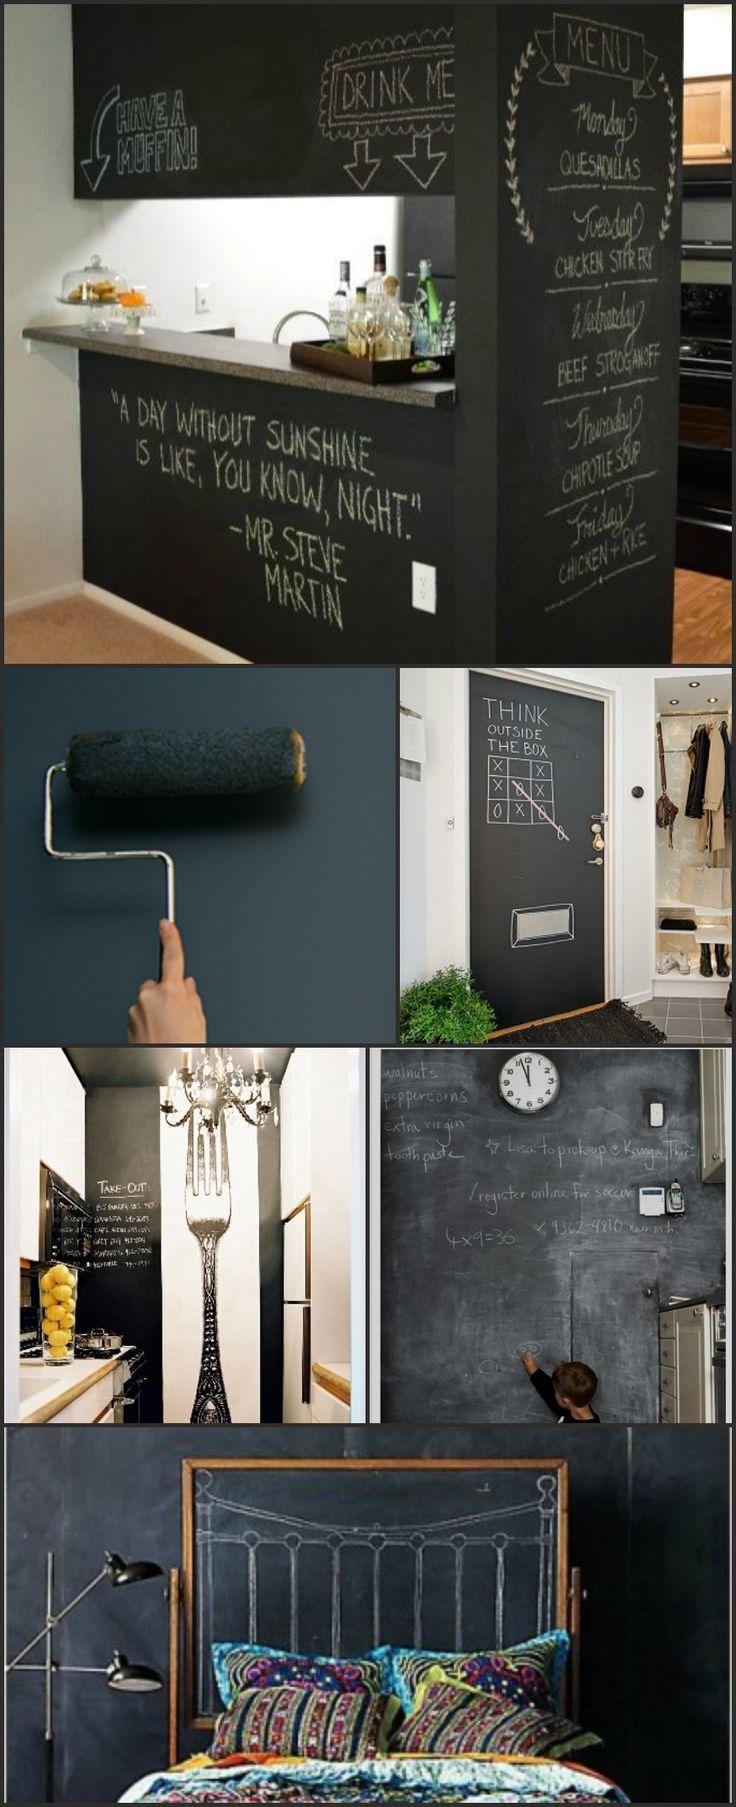 Oltre 25 fantastiche idee su pittura pareti su pinterest - Idee pittura pareti cucina ...